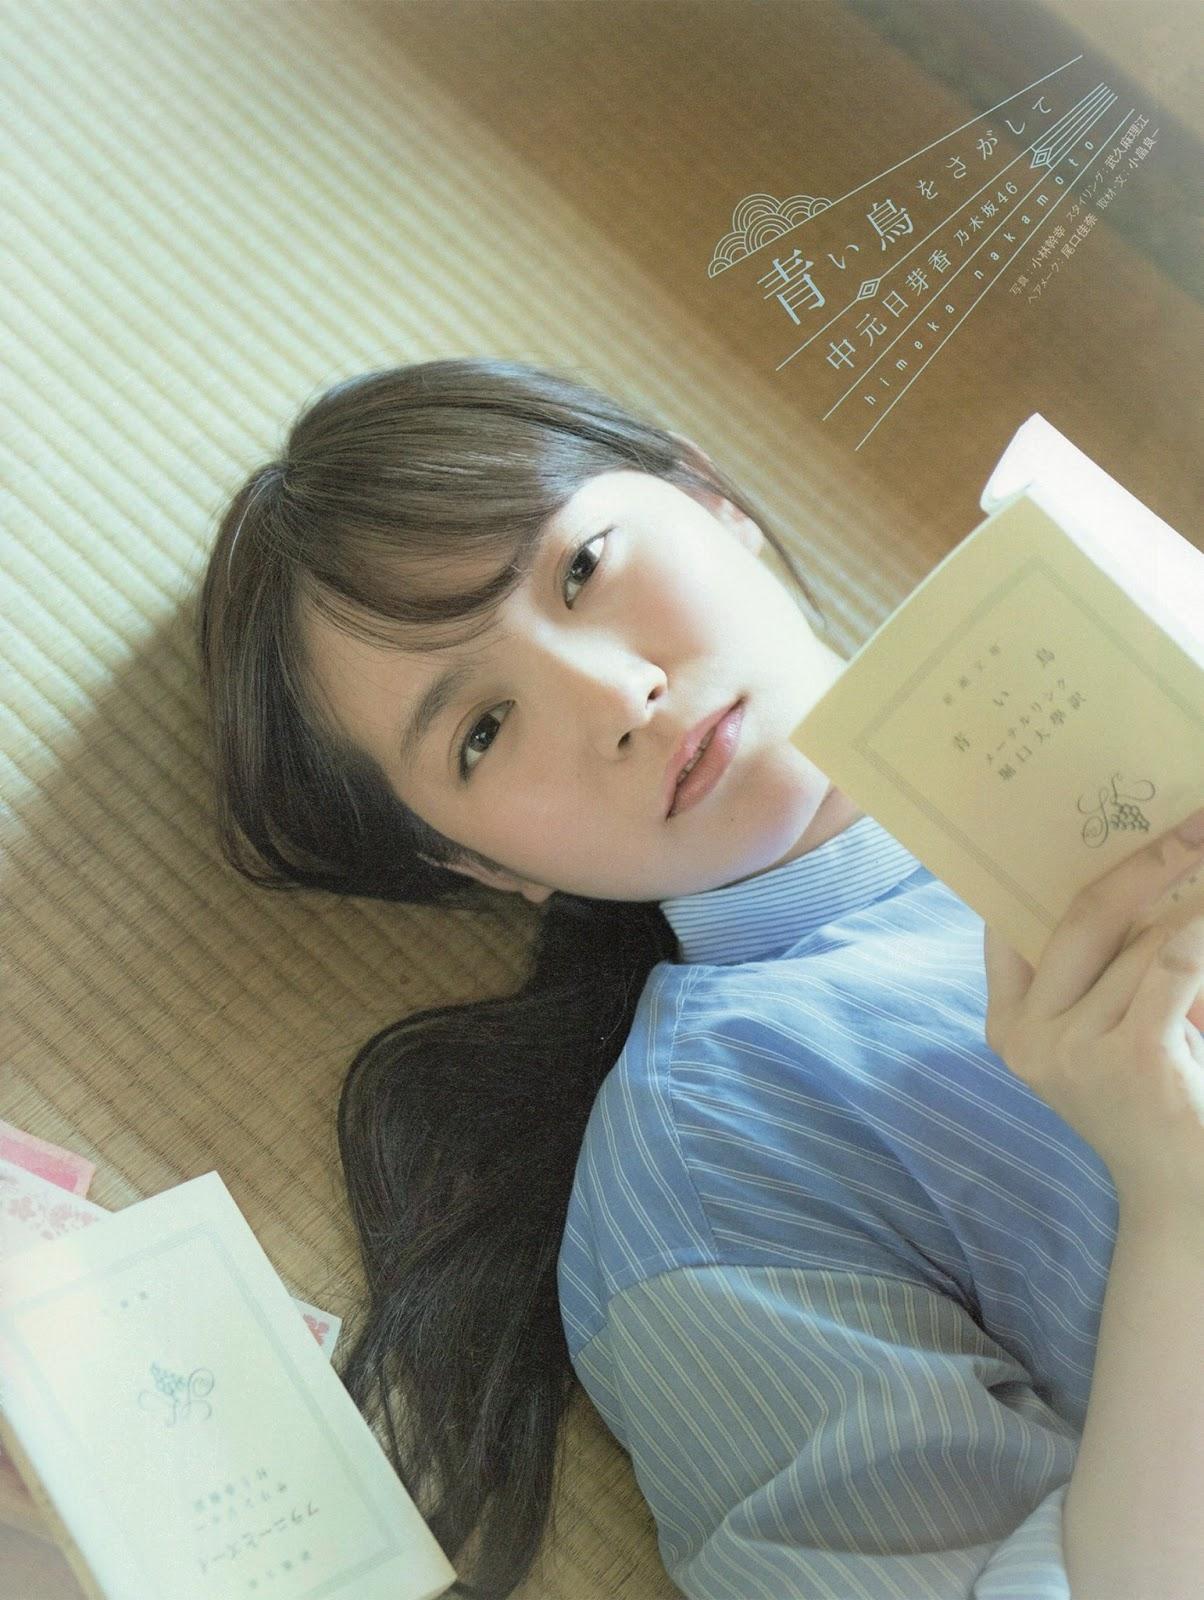 Nakamoto Himeka 中元日芽香 Nogizaka46, B.L.T Graph 2017年7月号